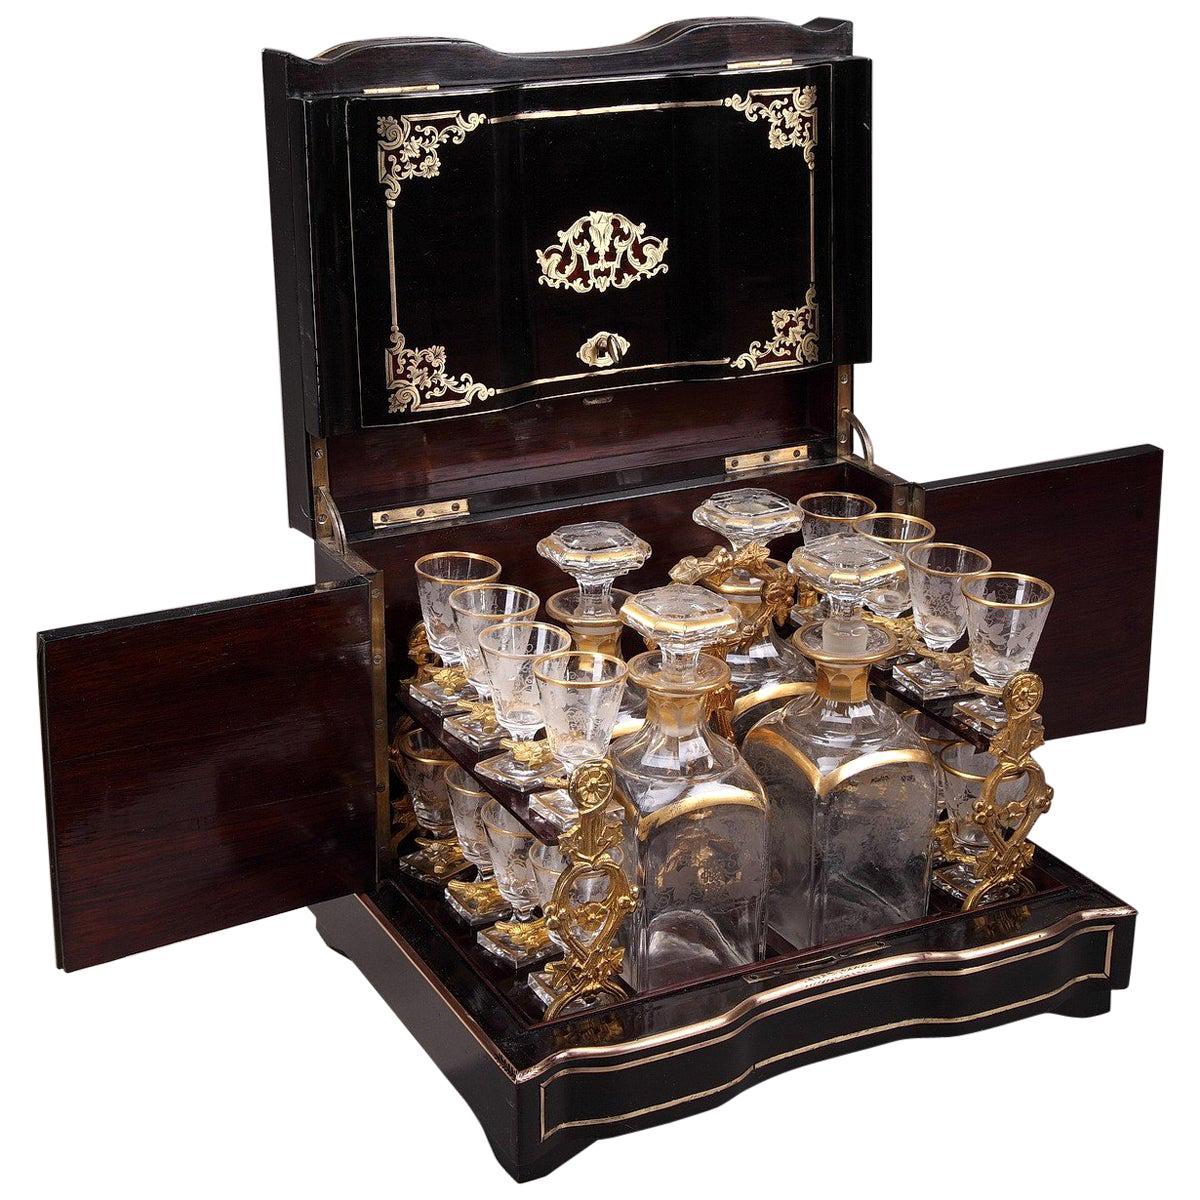 19th Century Napoleon III Liquor Cellar in Ebony with Brass Inlay